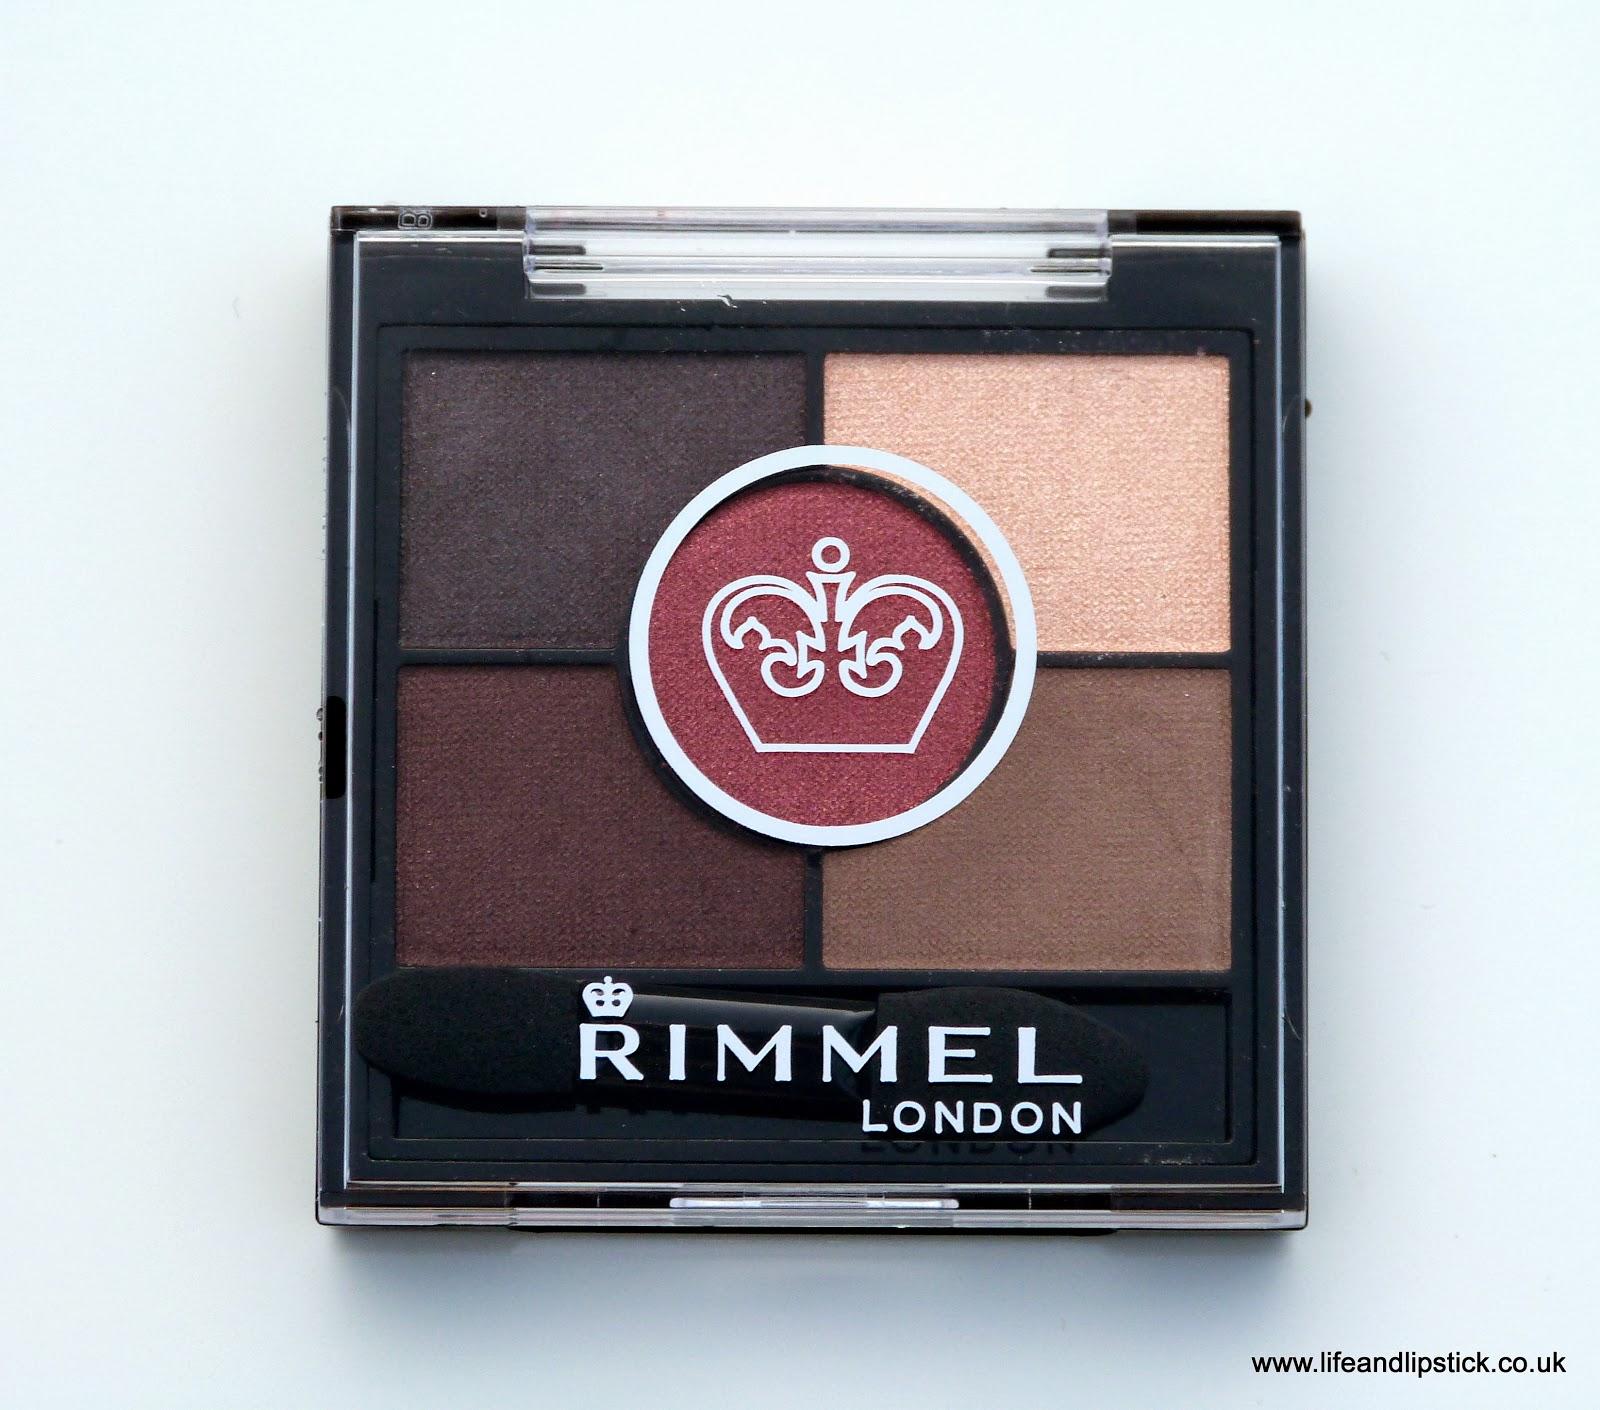 Rimmel London Eyeshadow Palette Brixton Brown